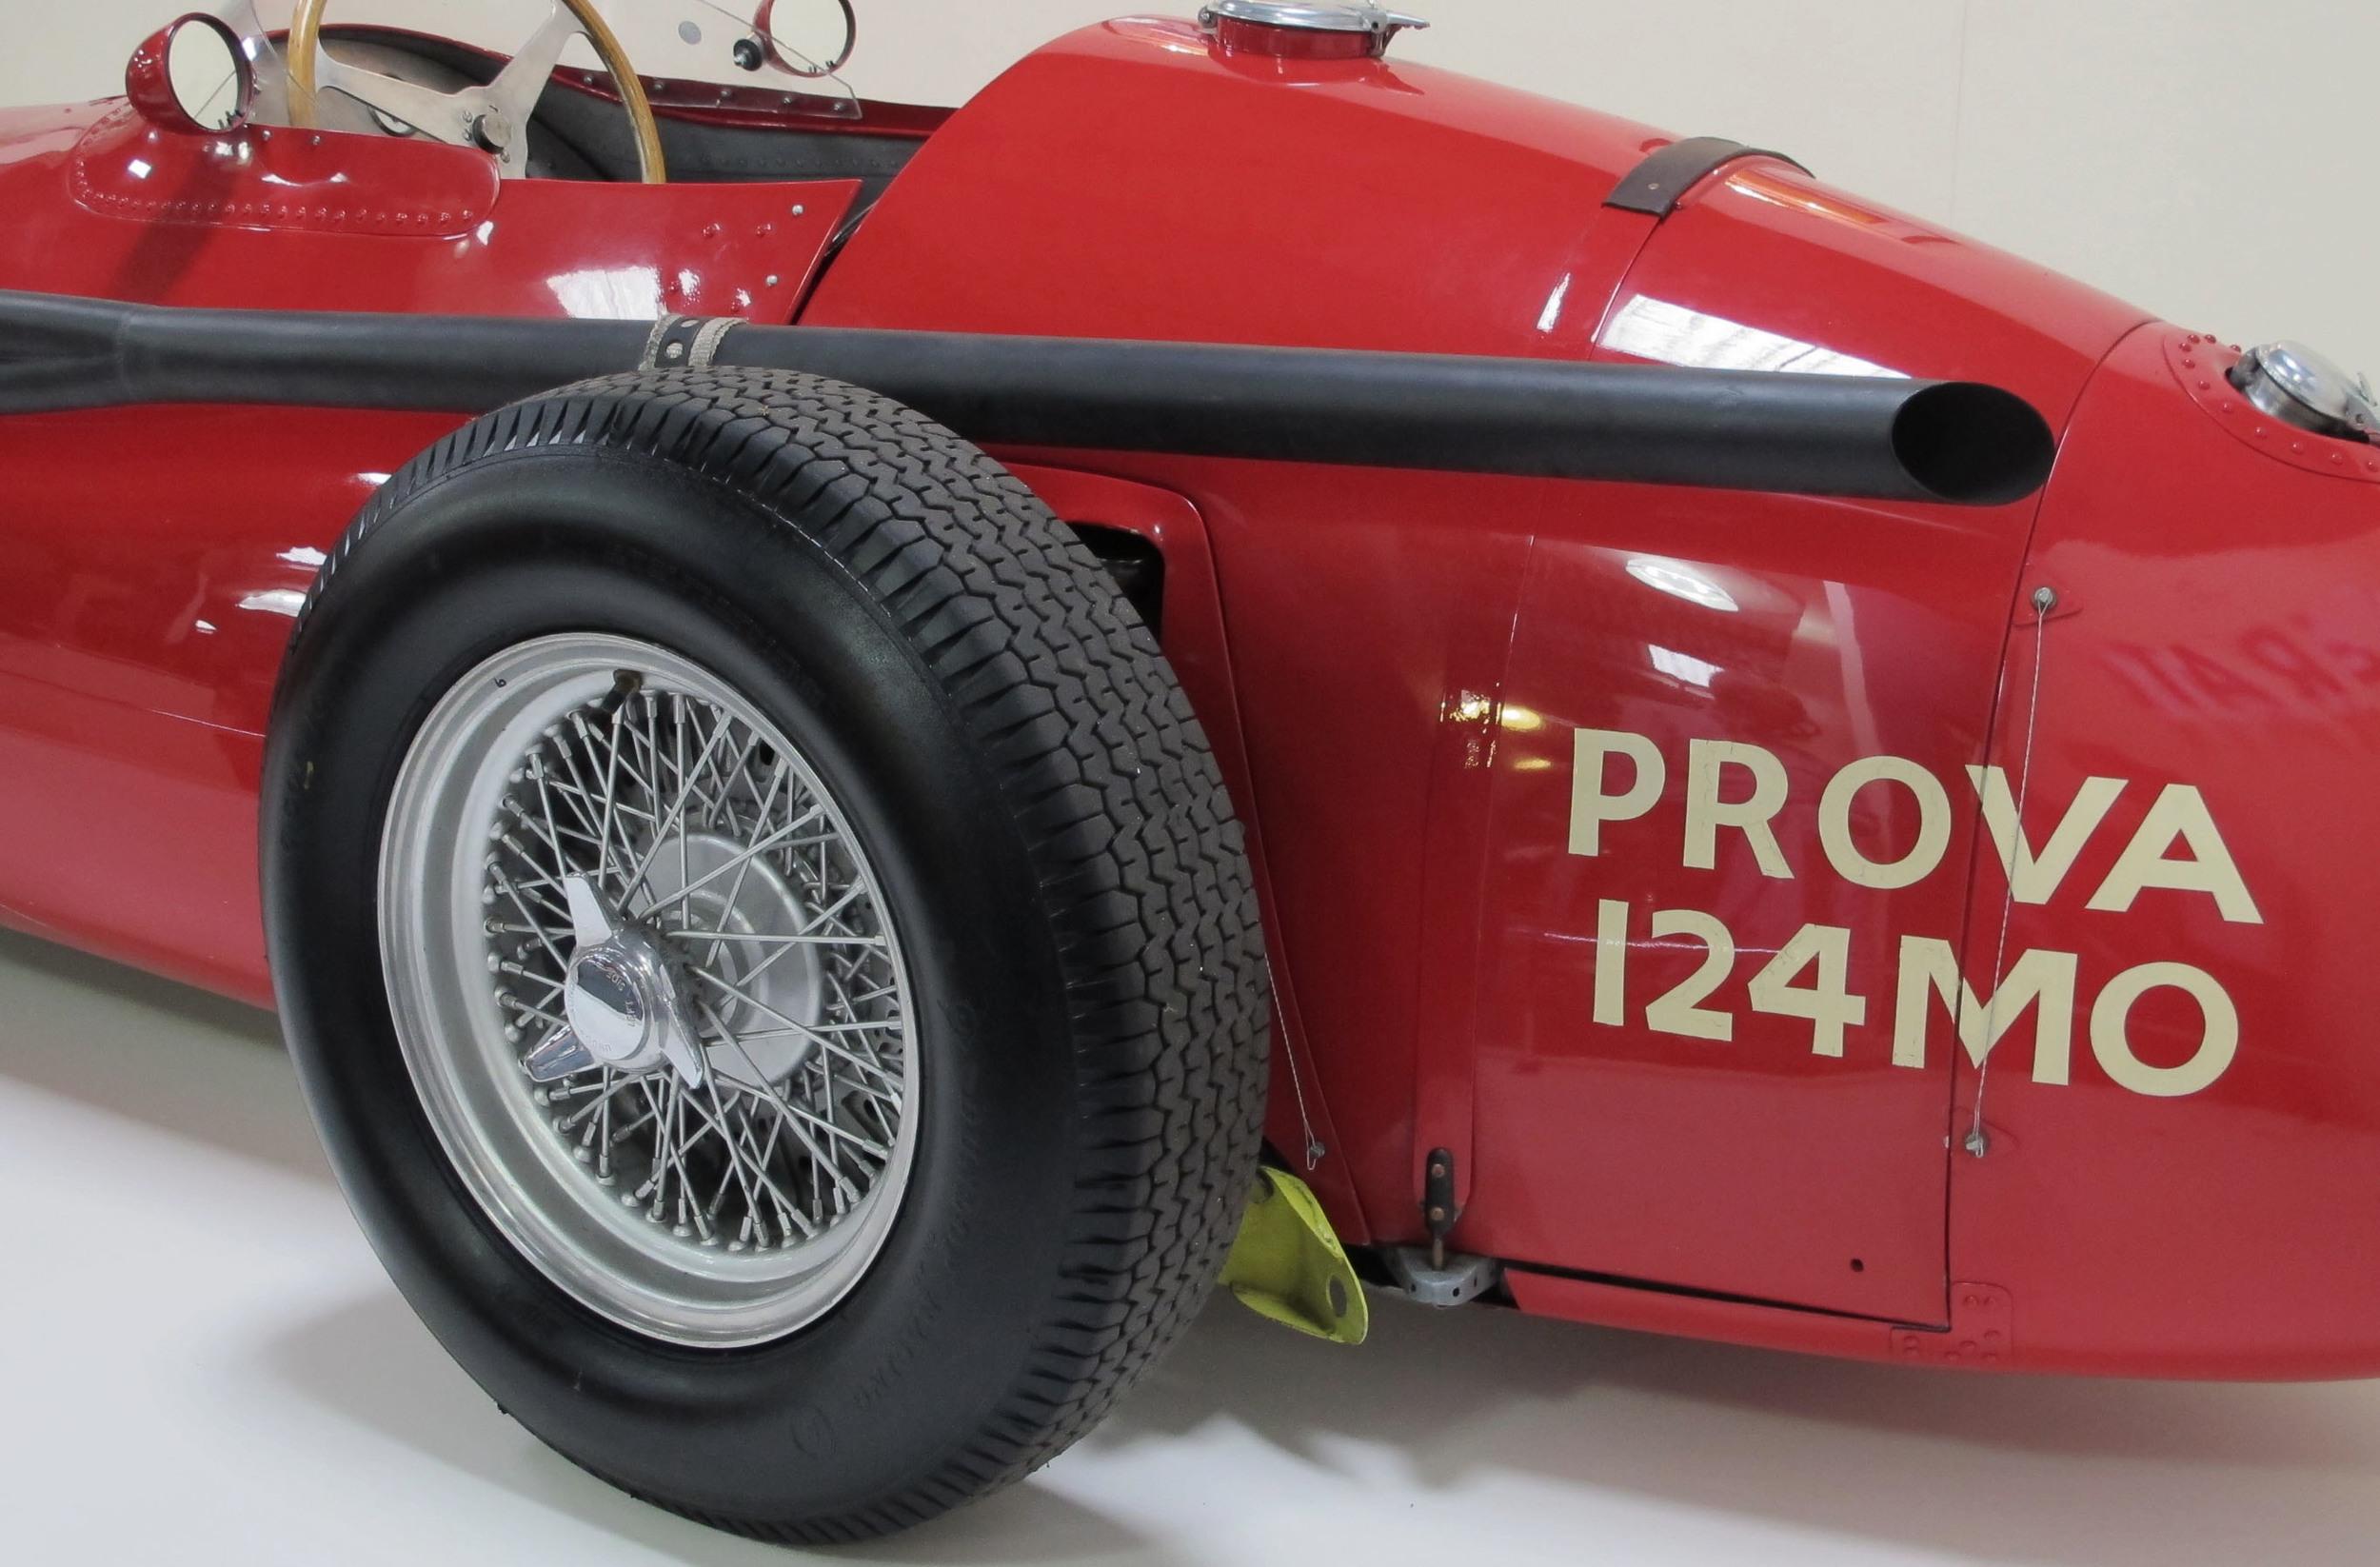 the great 250f.jpg